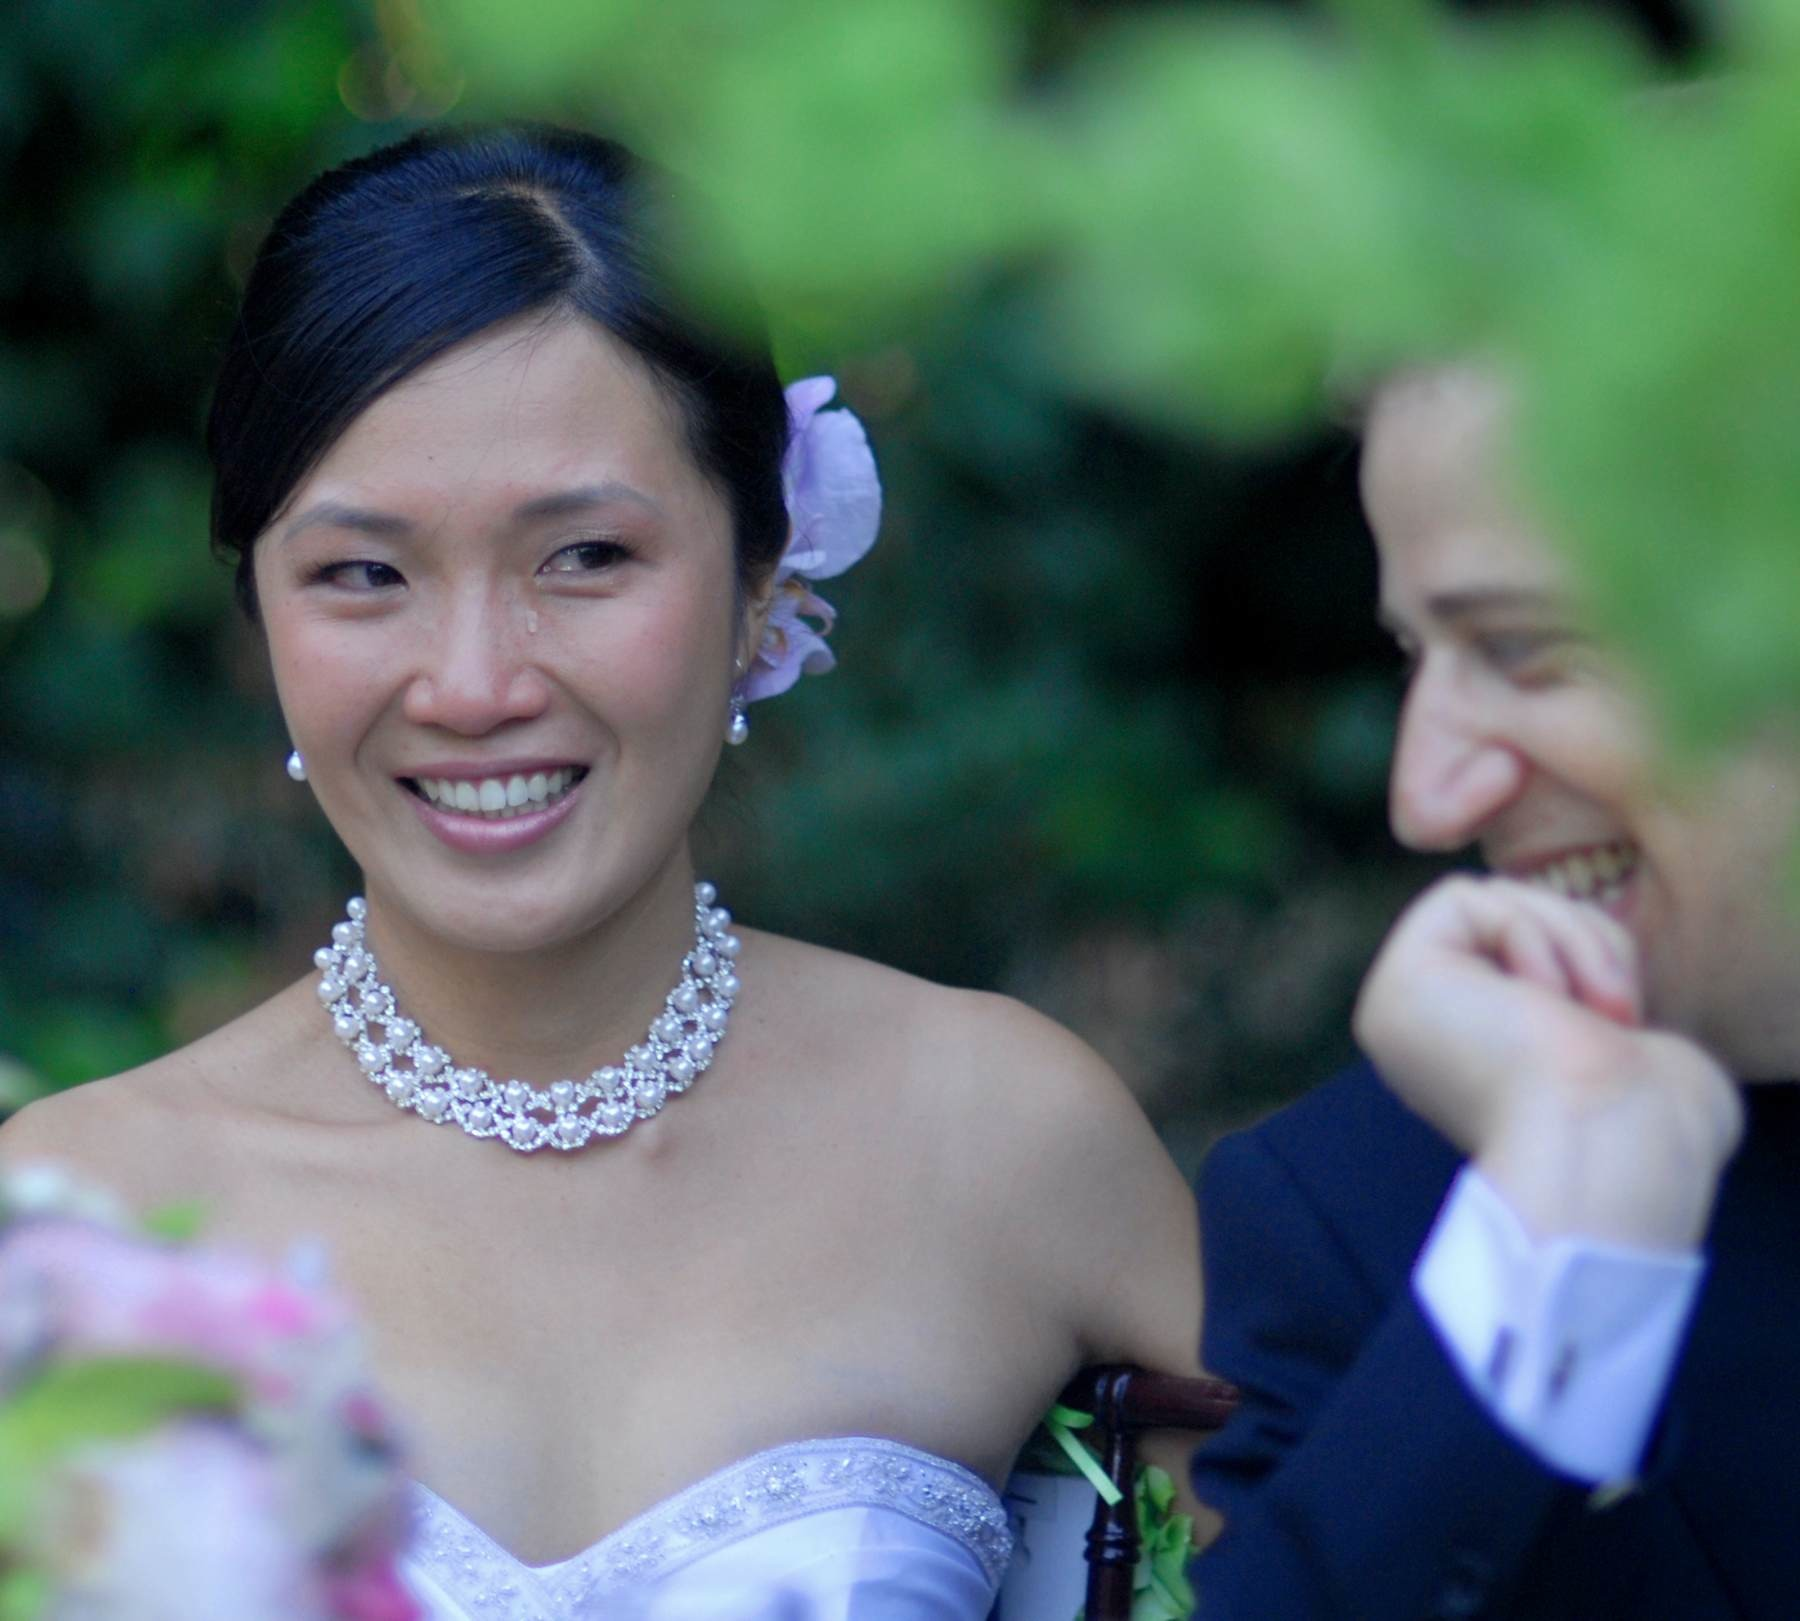 San Francisco Bay Area Destination Wedding Photographer Thomas Fogarty Wedding Image / Photo